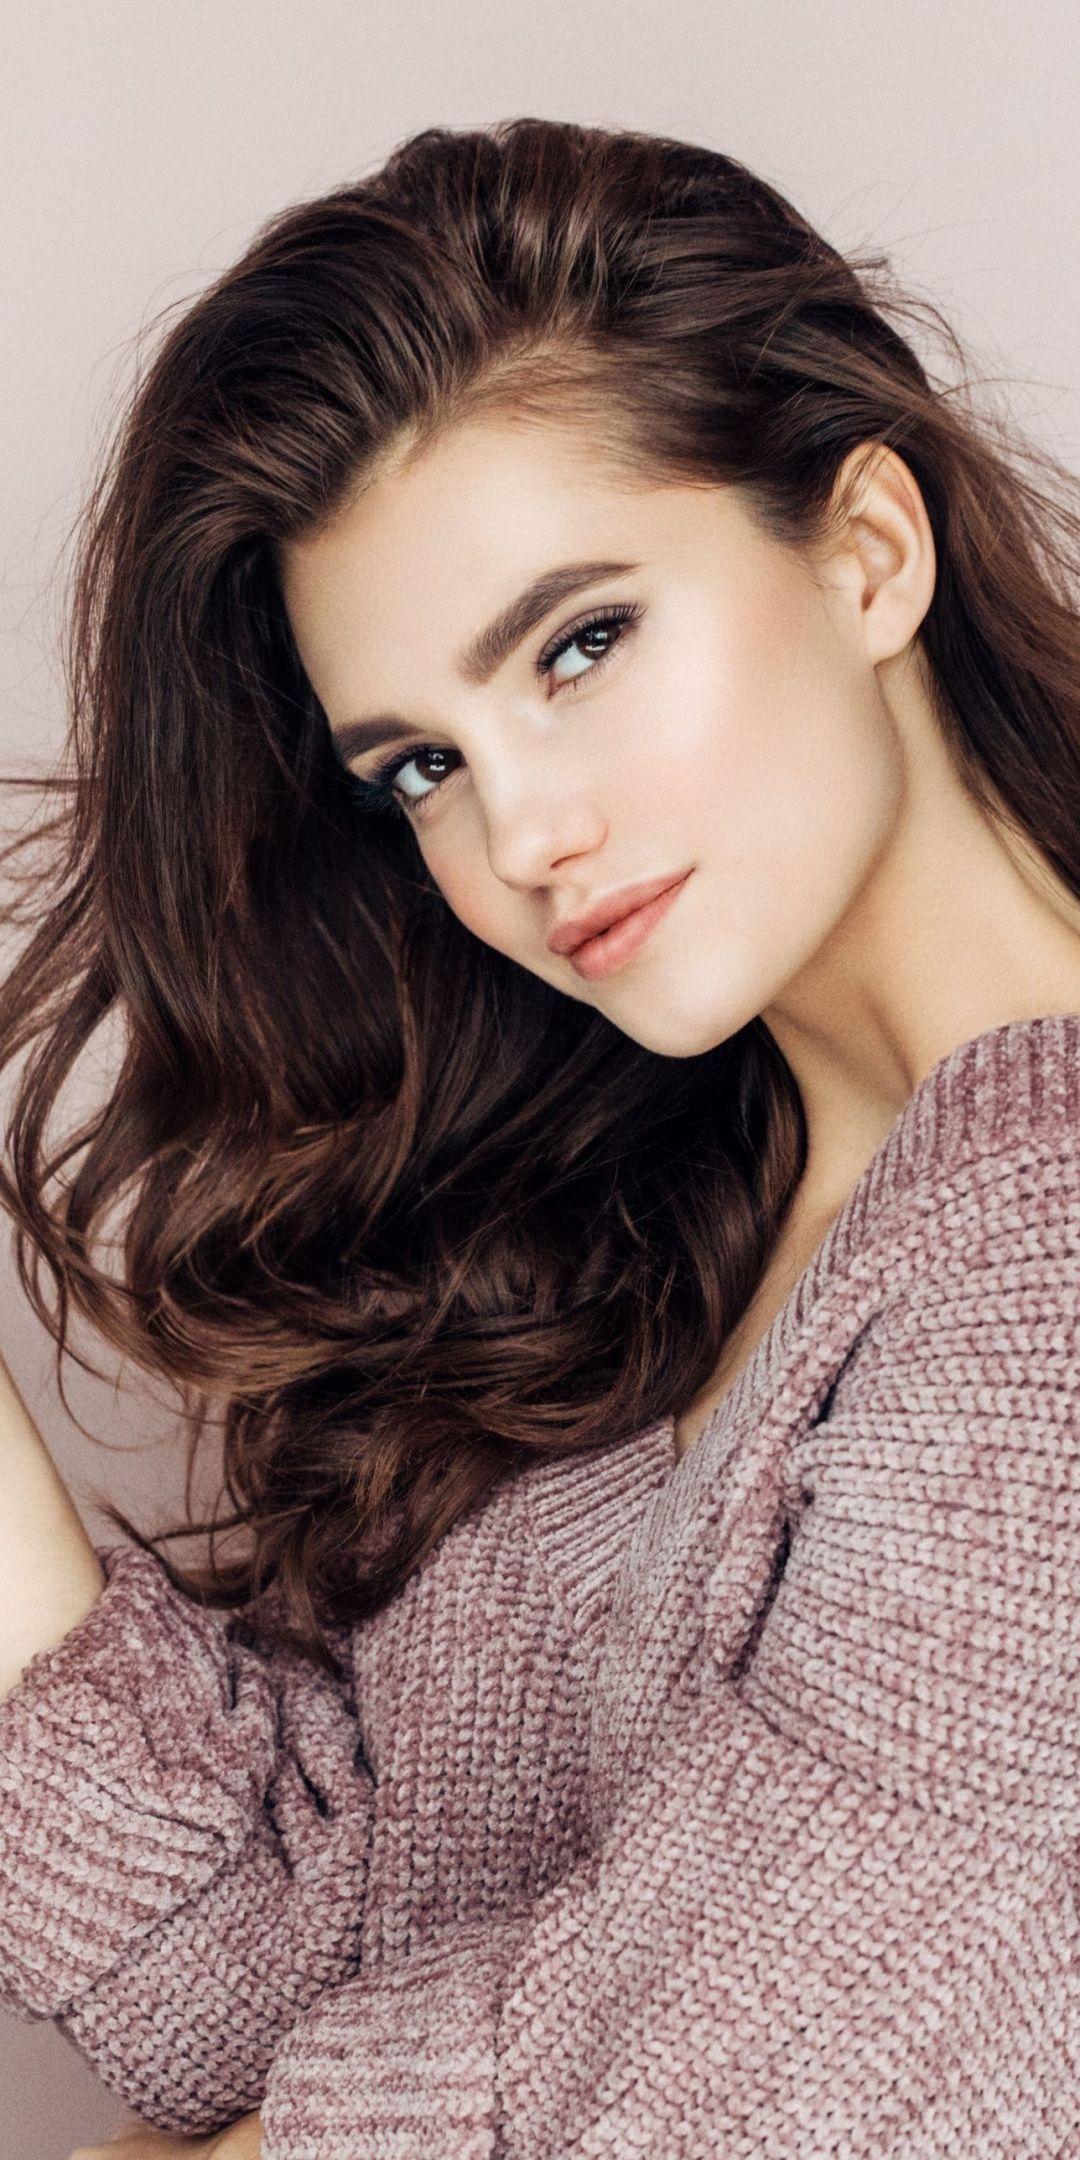 Pretty Curly Hair Beautiful Girl 2018 1080x2160